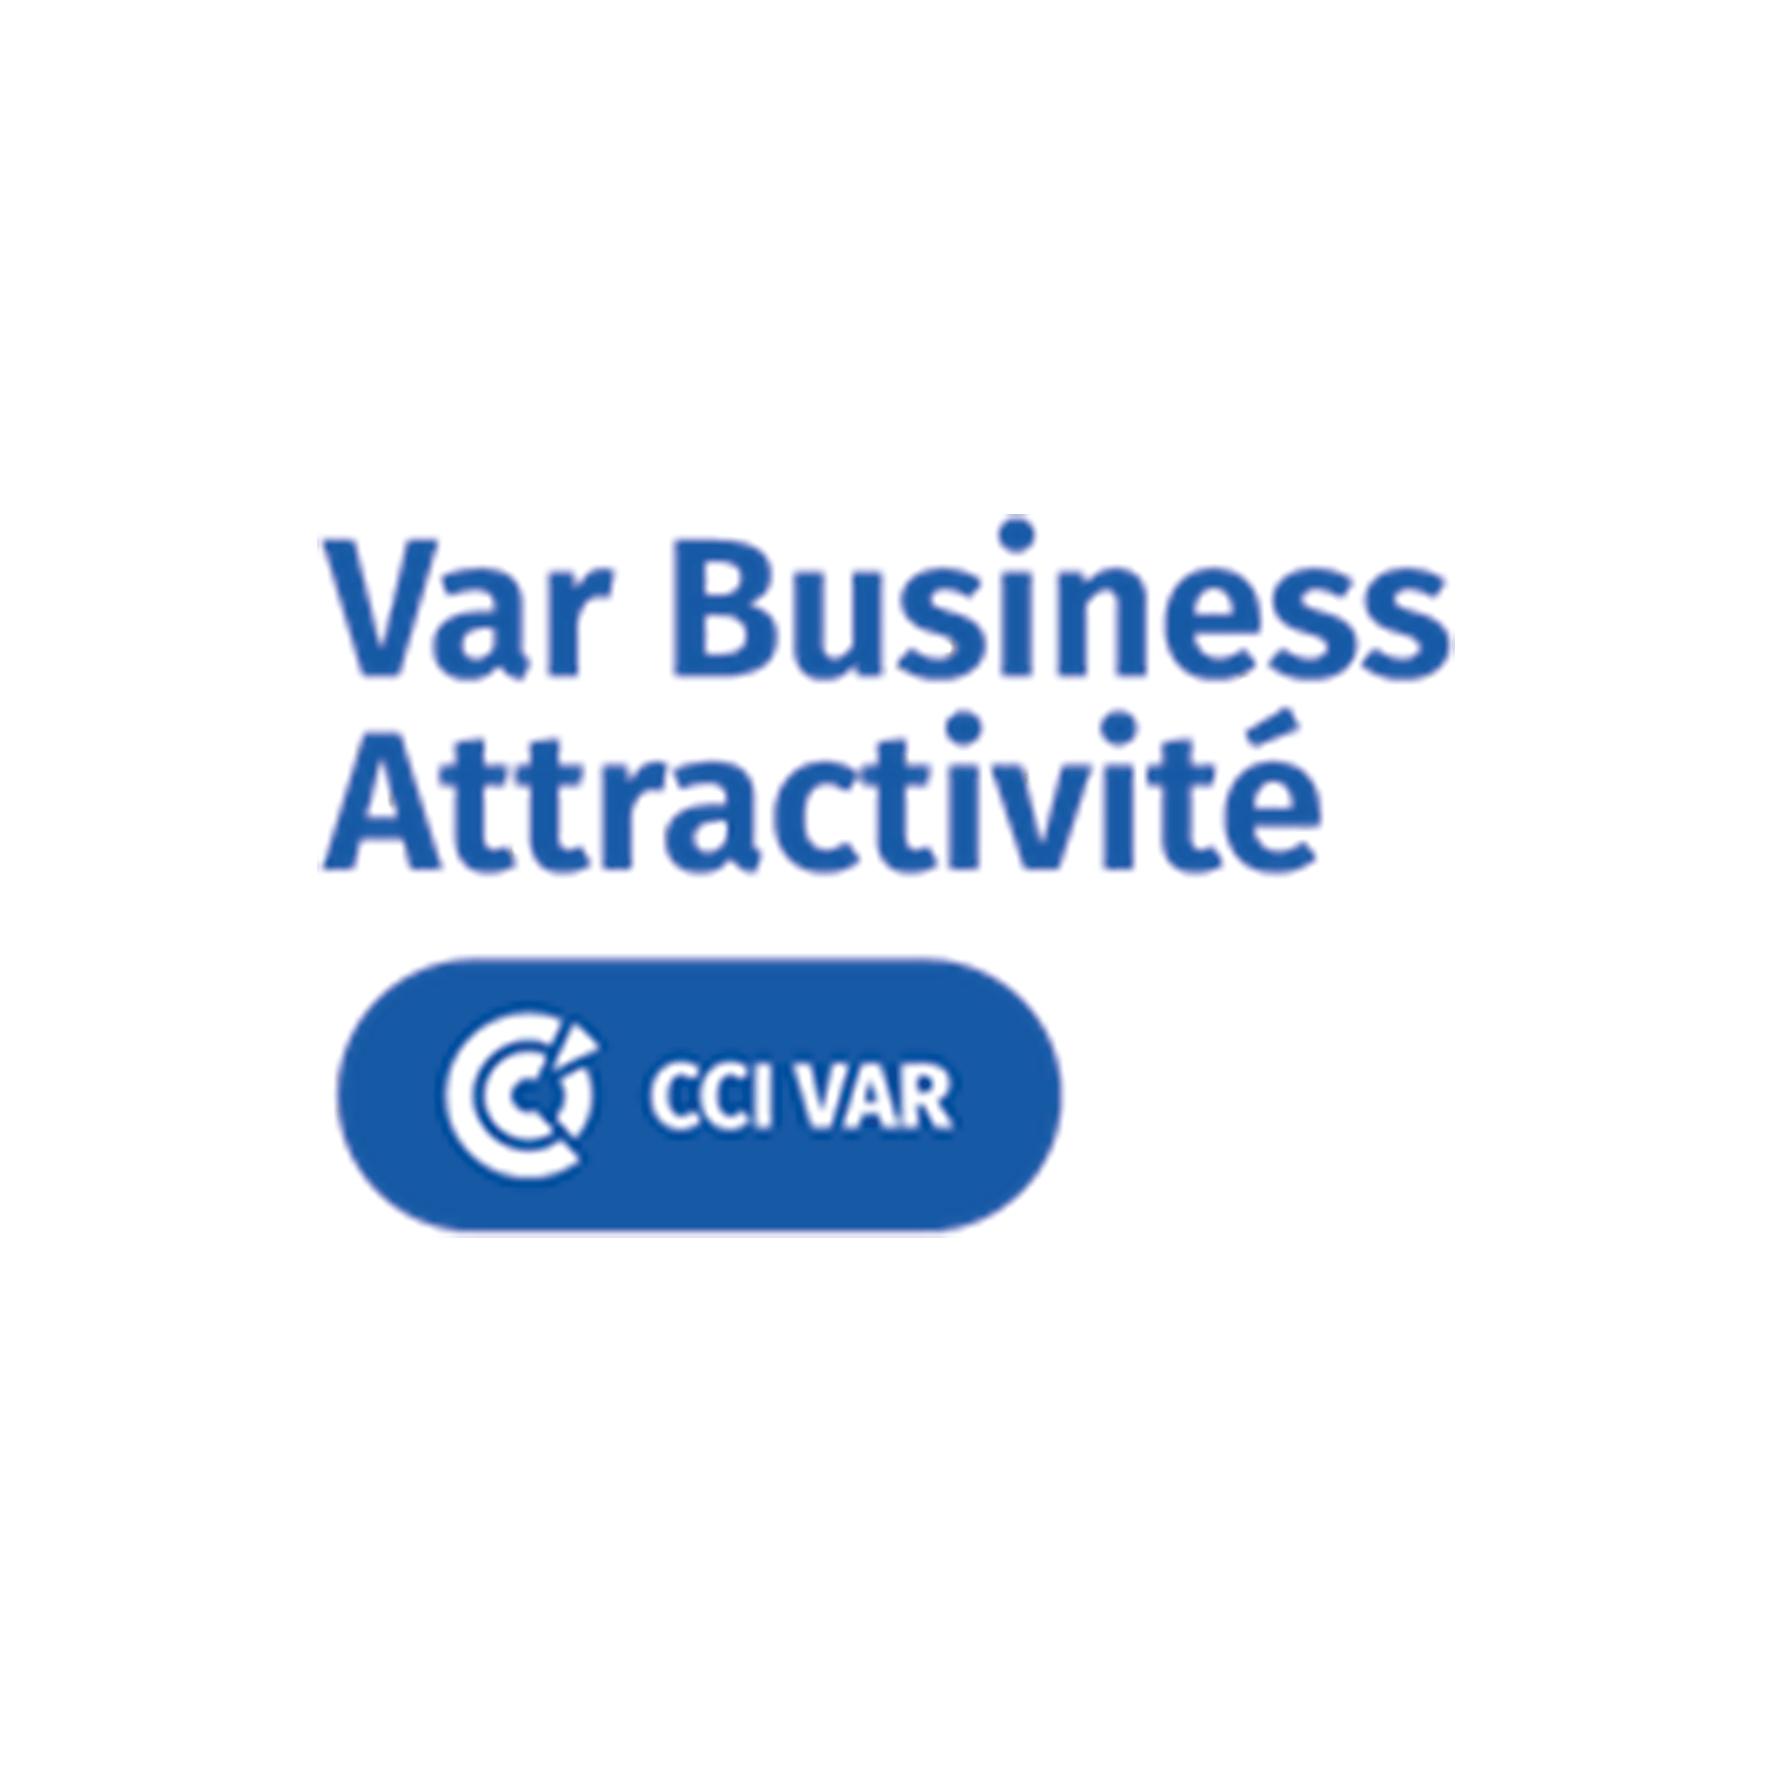 Var Business Attractivité 1772x1772 CMJN